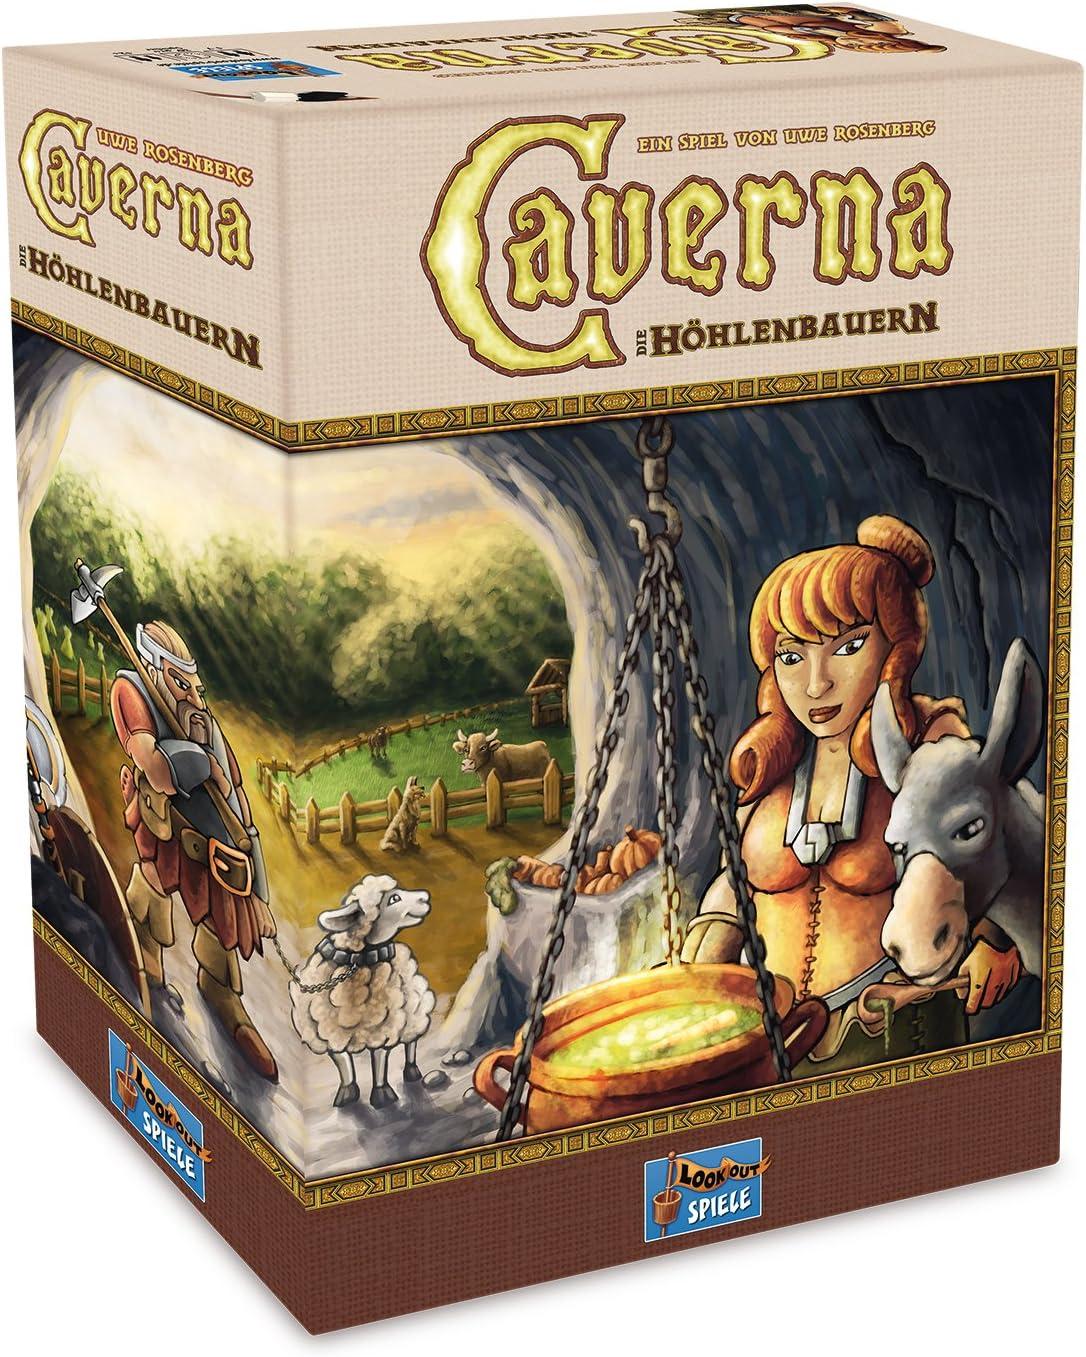 Lookout Games 22160070 – Caverna, iniciados Parte de Uwe Rose ...